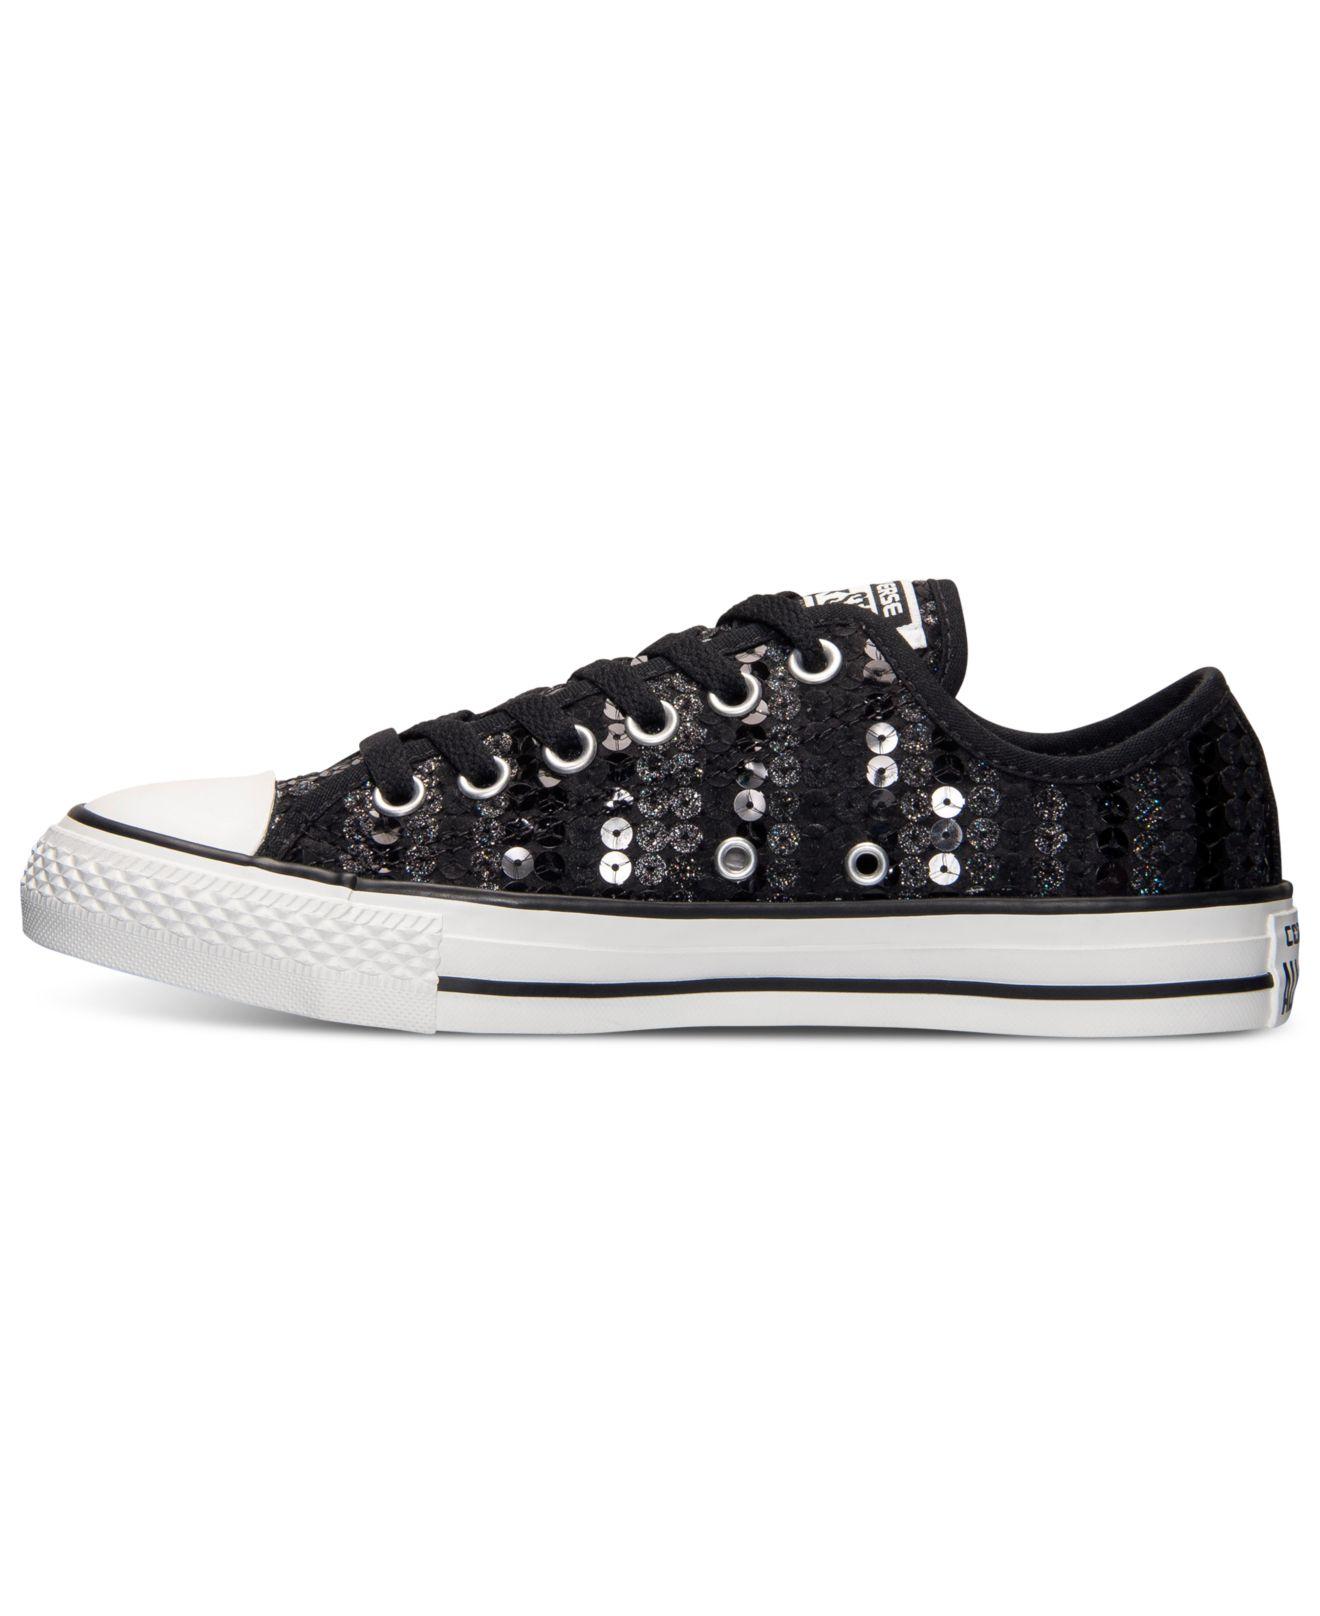 black sequin converse sneakers